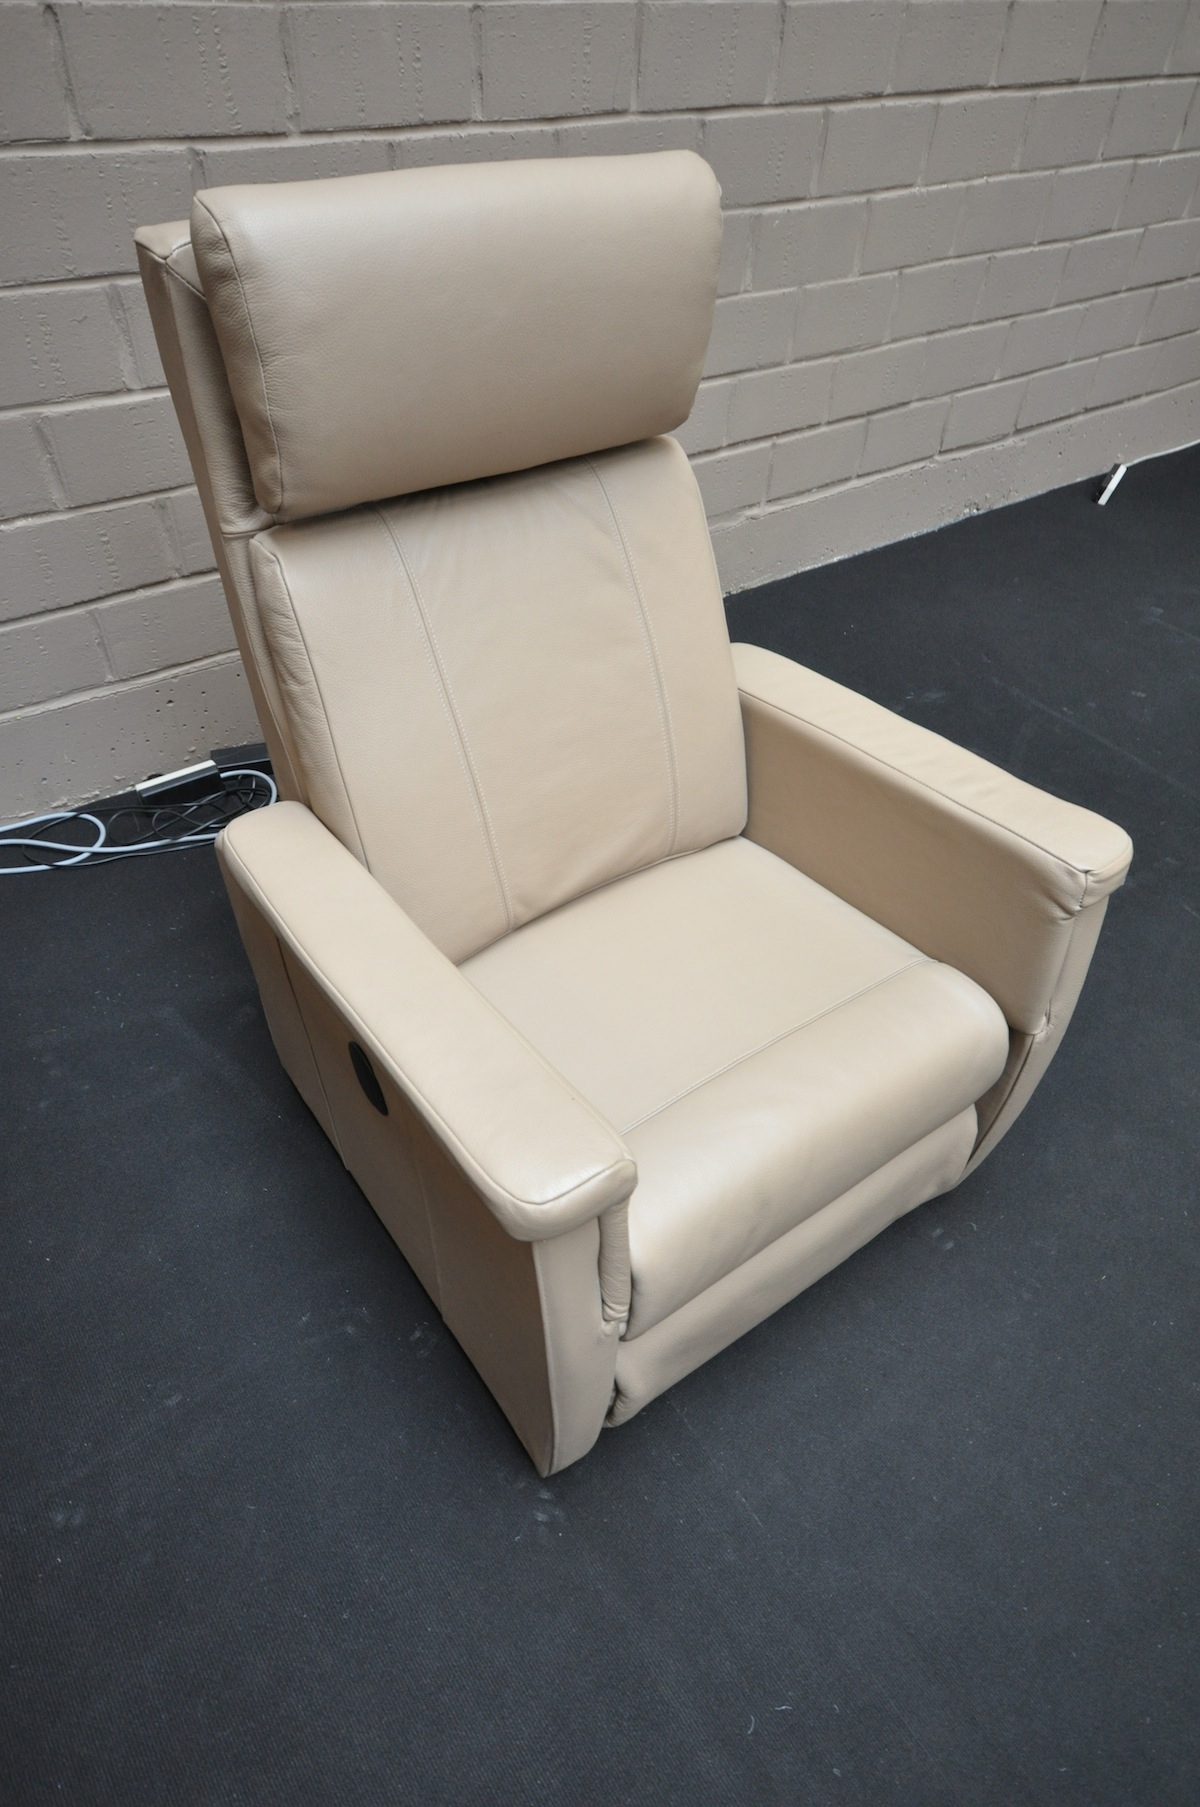 fauteuil relax en solde maison design. Black Bedroom Furniture Sets. Home Design Ideas